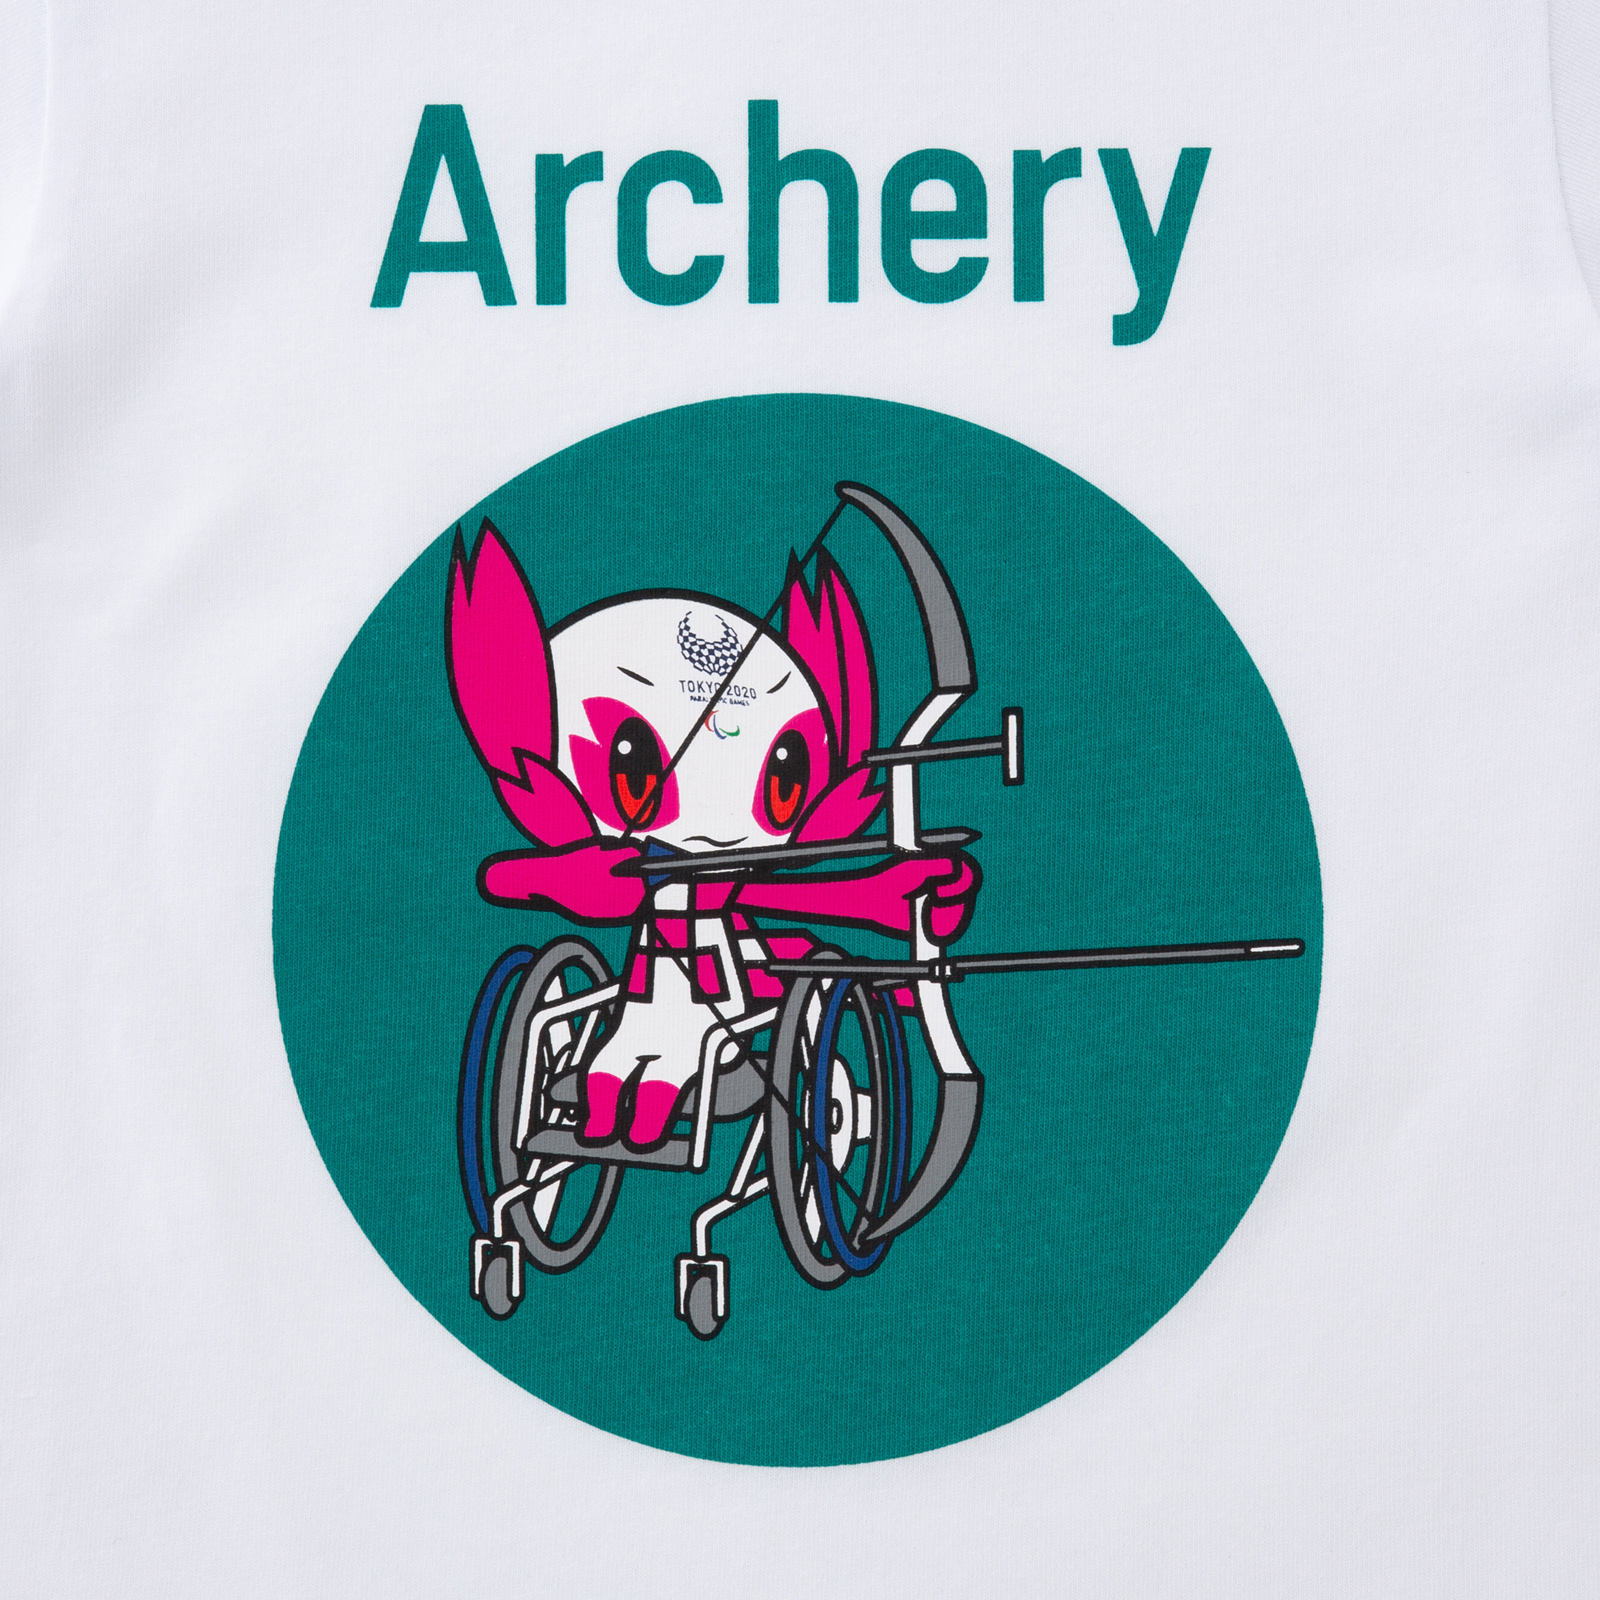 KIDSTシャツアーチェリー(東京2020パラリンピックマスコット)